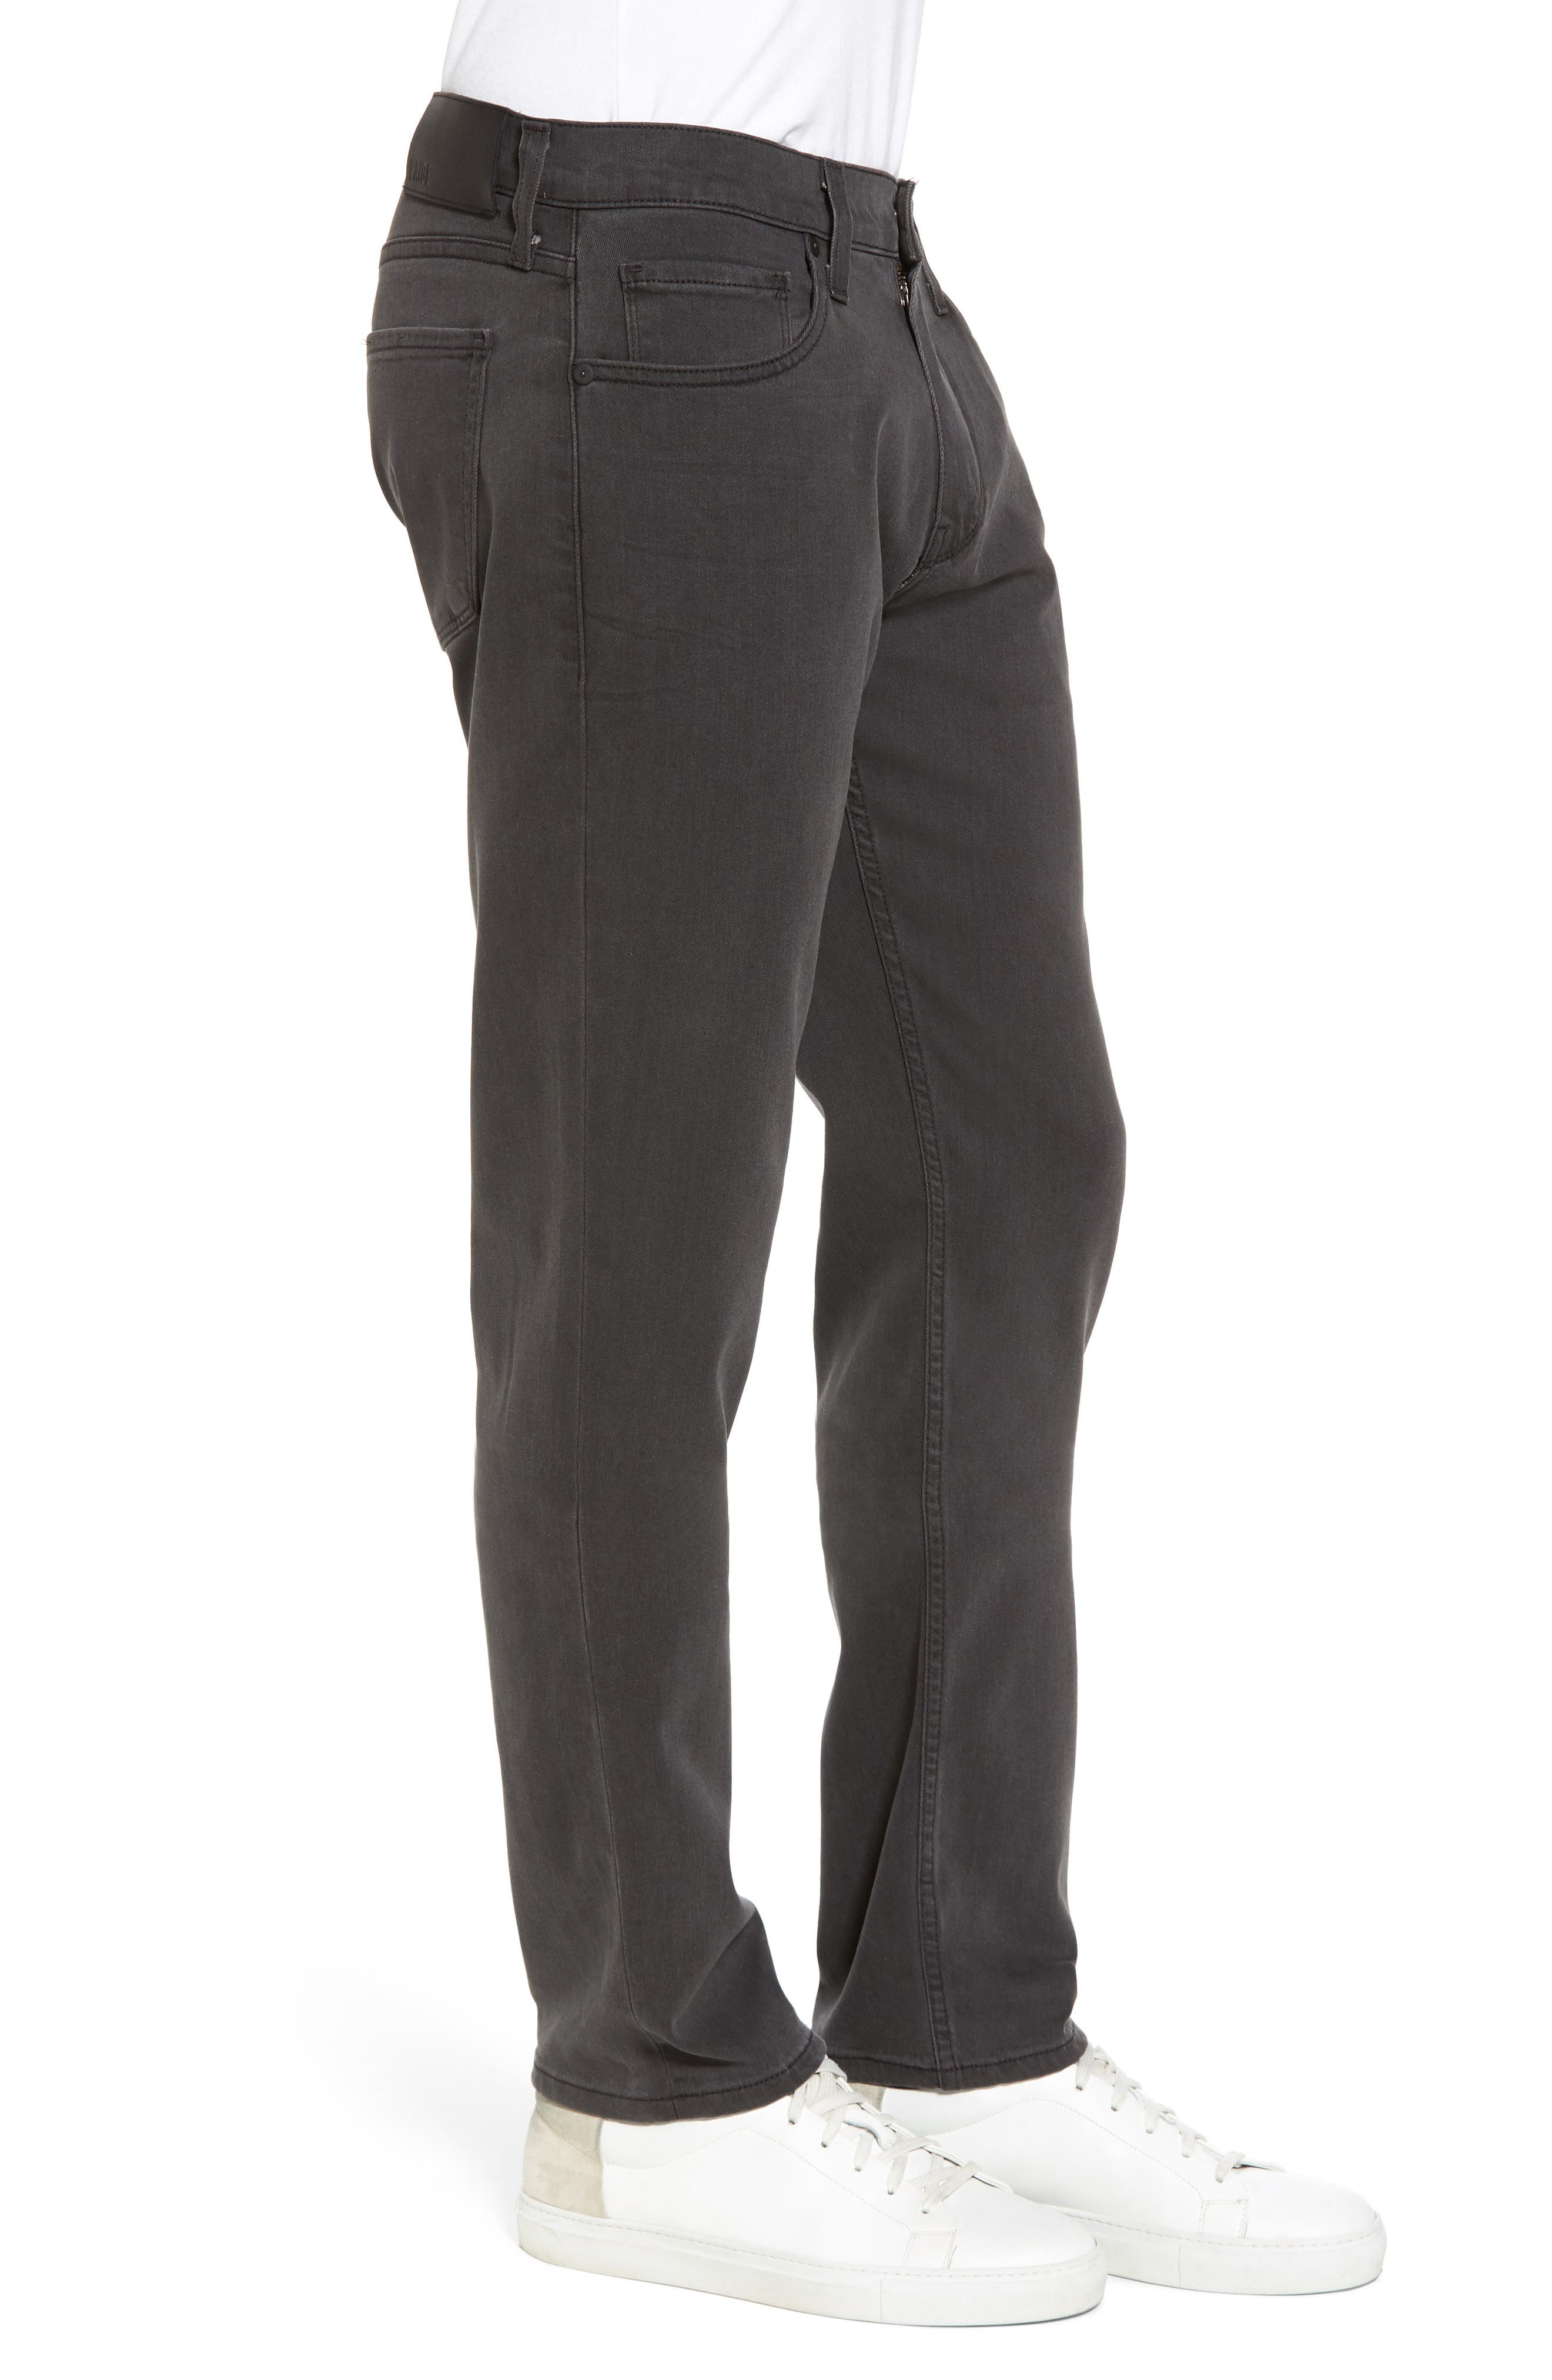 Transcend - Federal Slim Straight Leg Jeans,                             Alternate thumbnail 3, color,